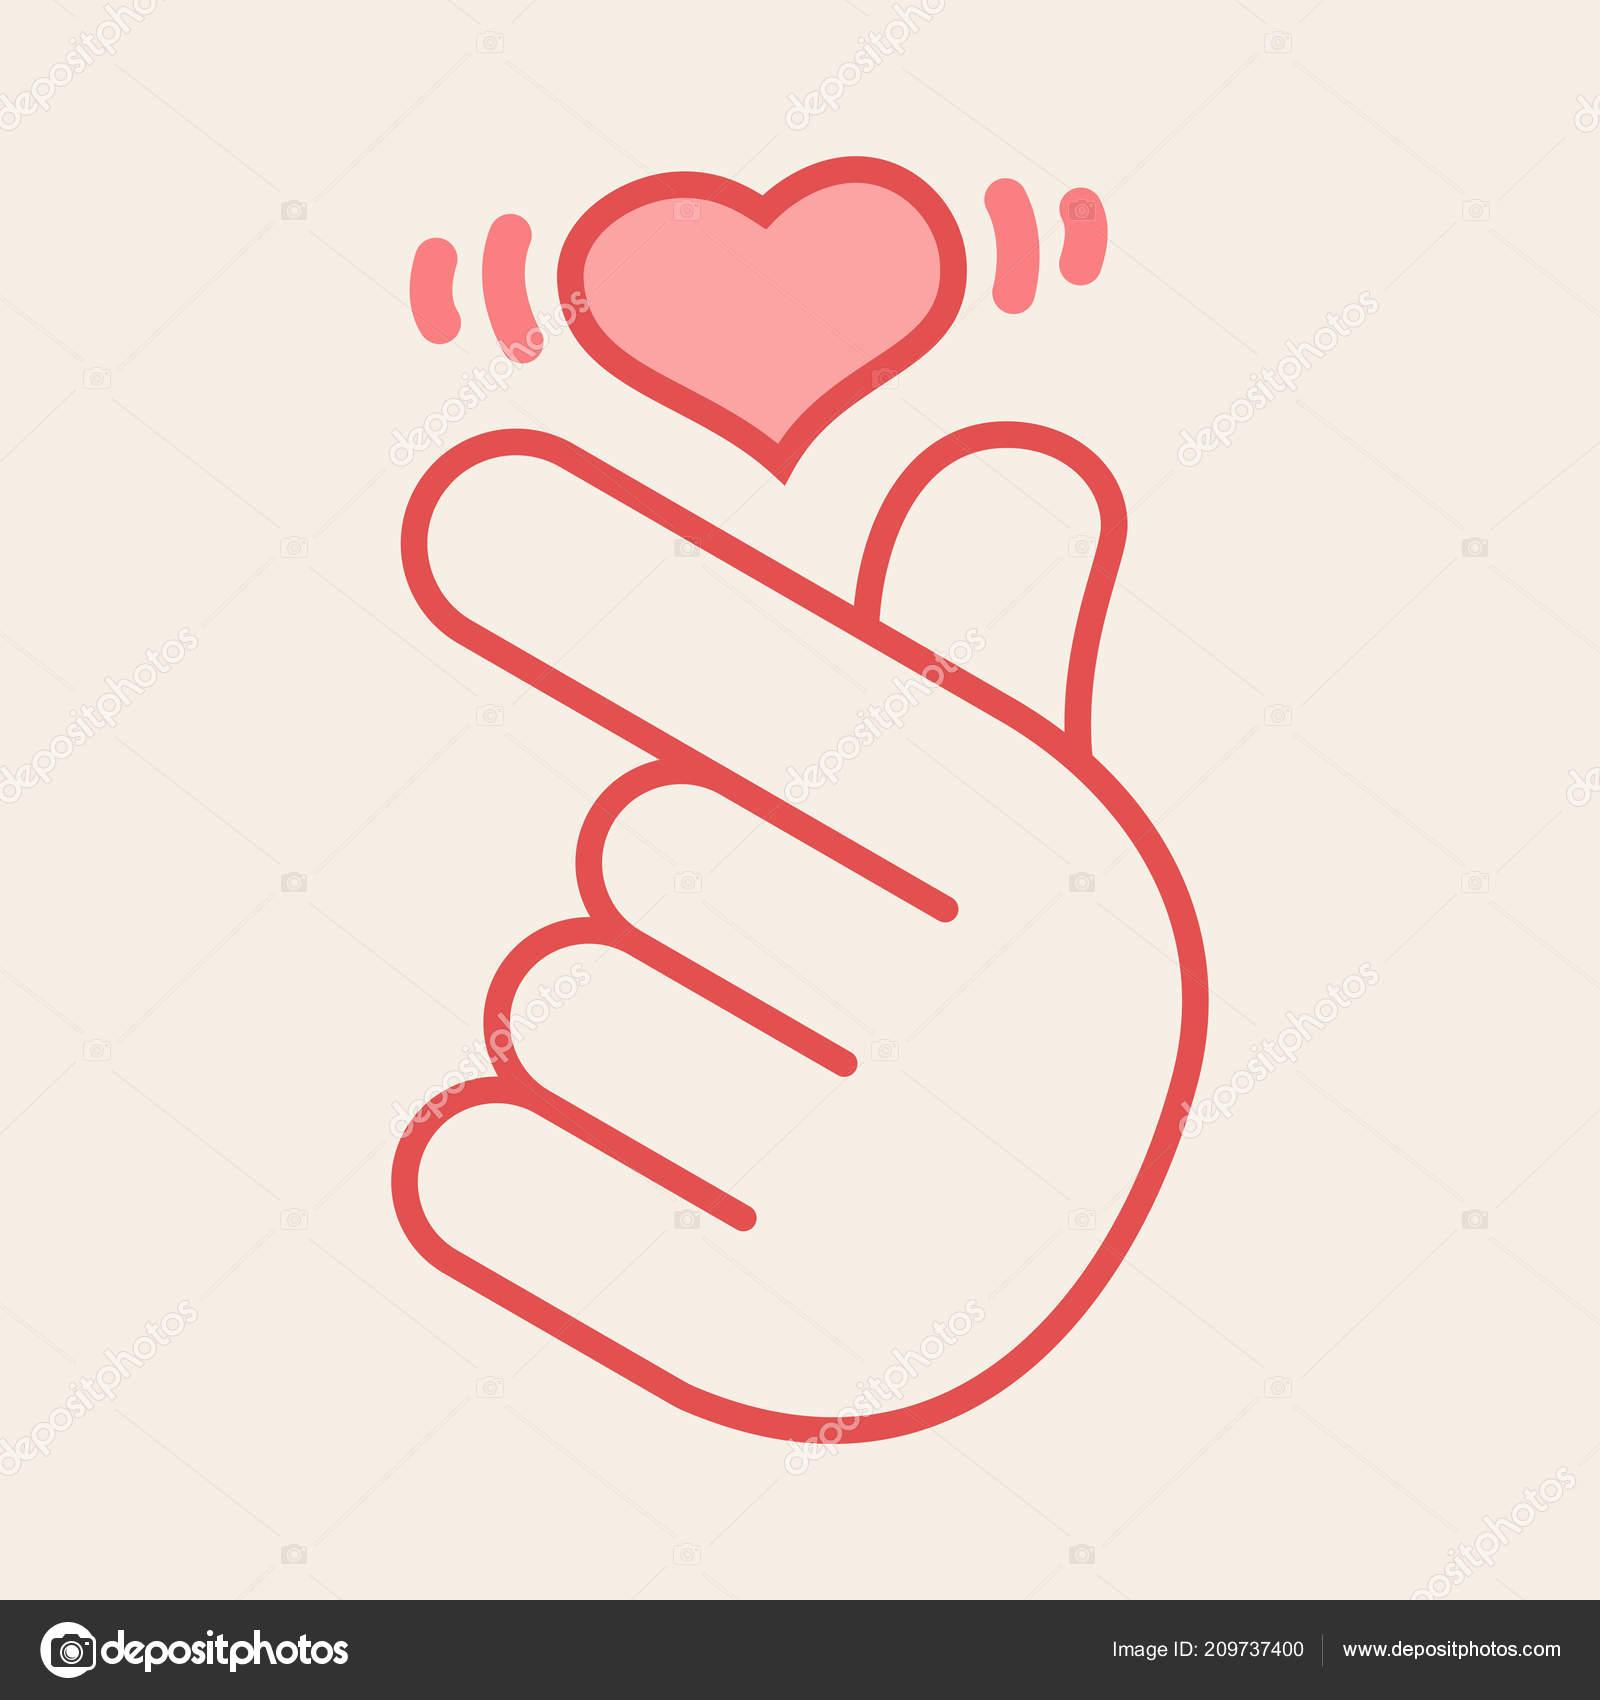 hand hearts korean - 612×612